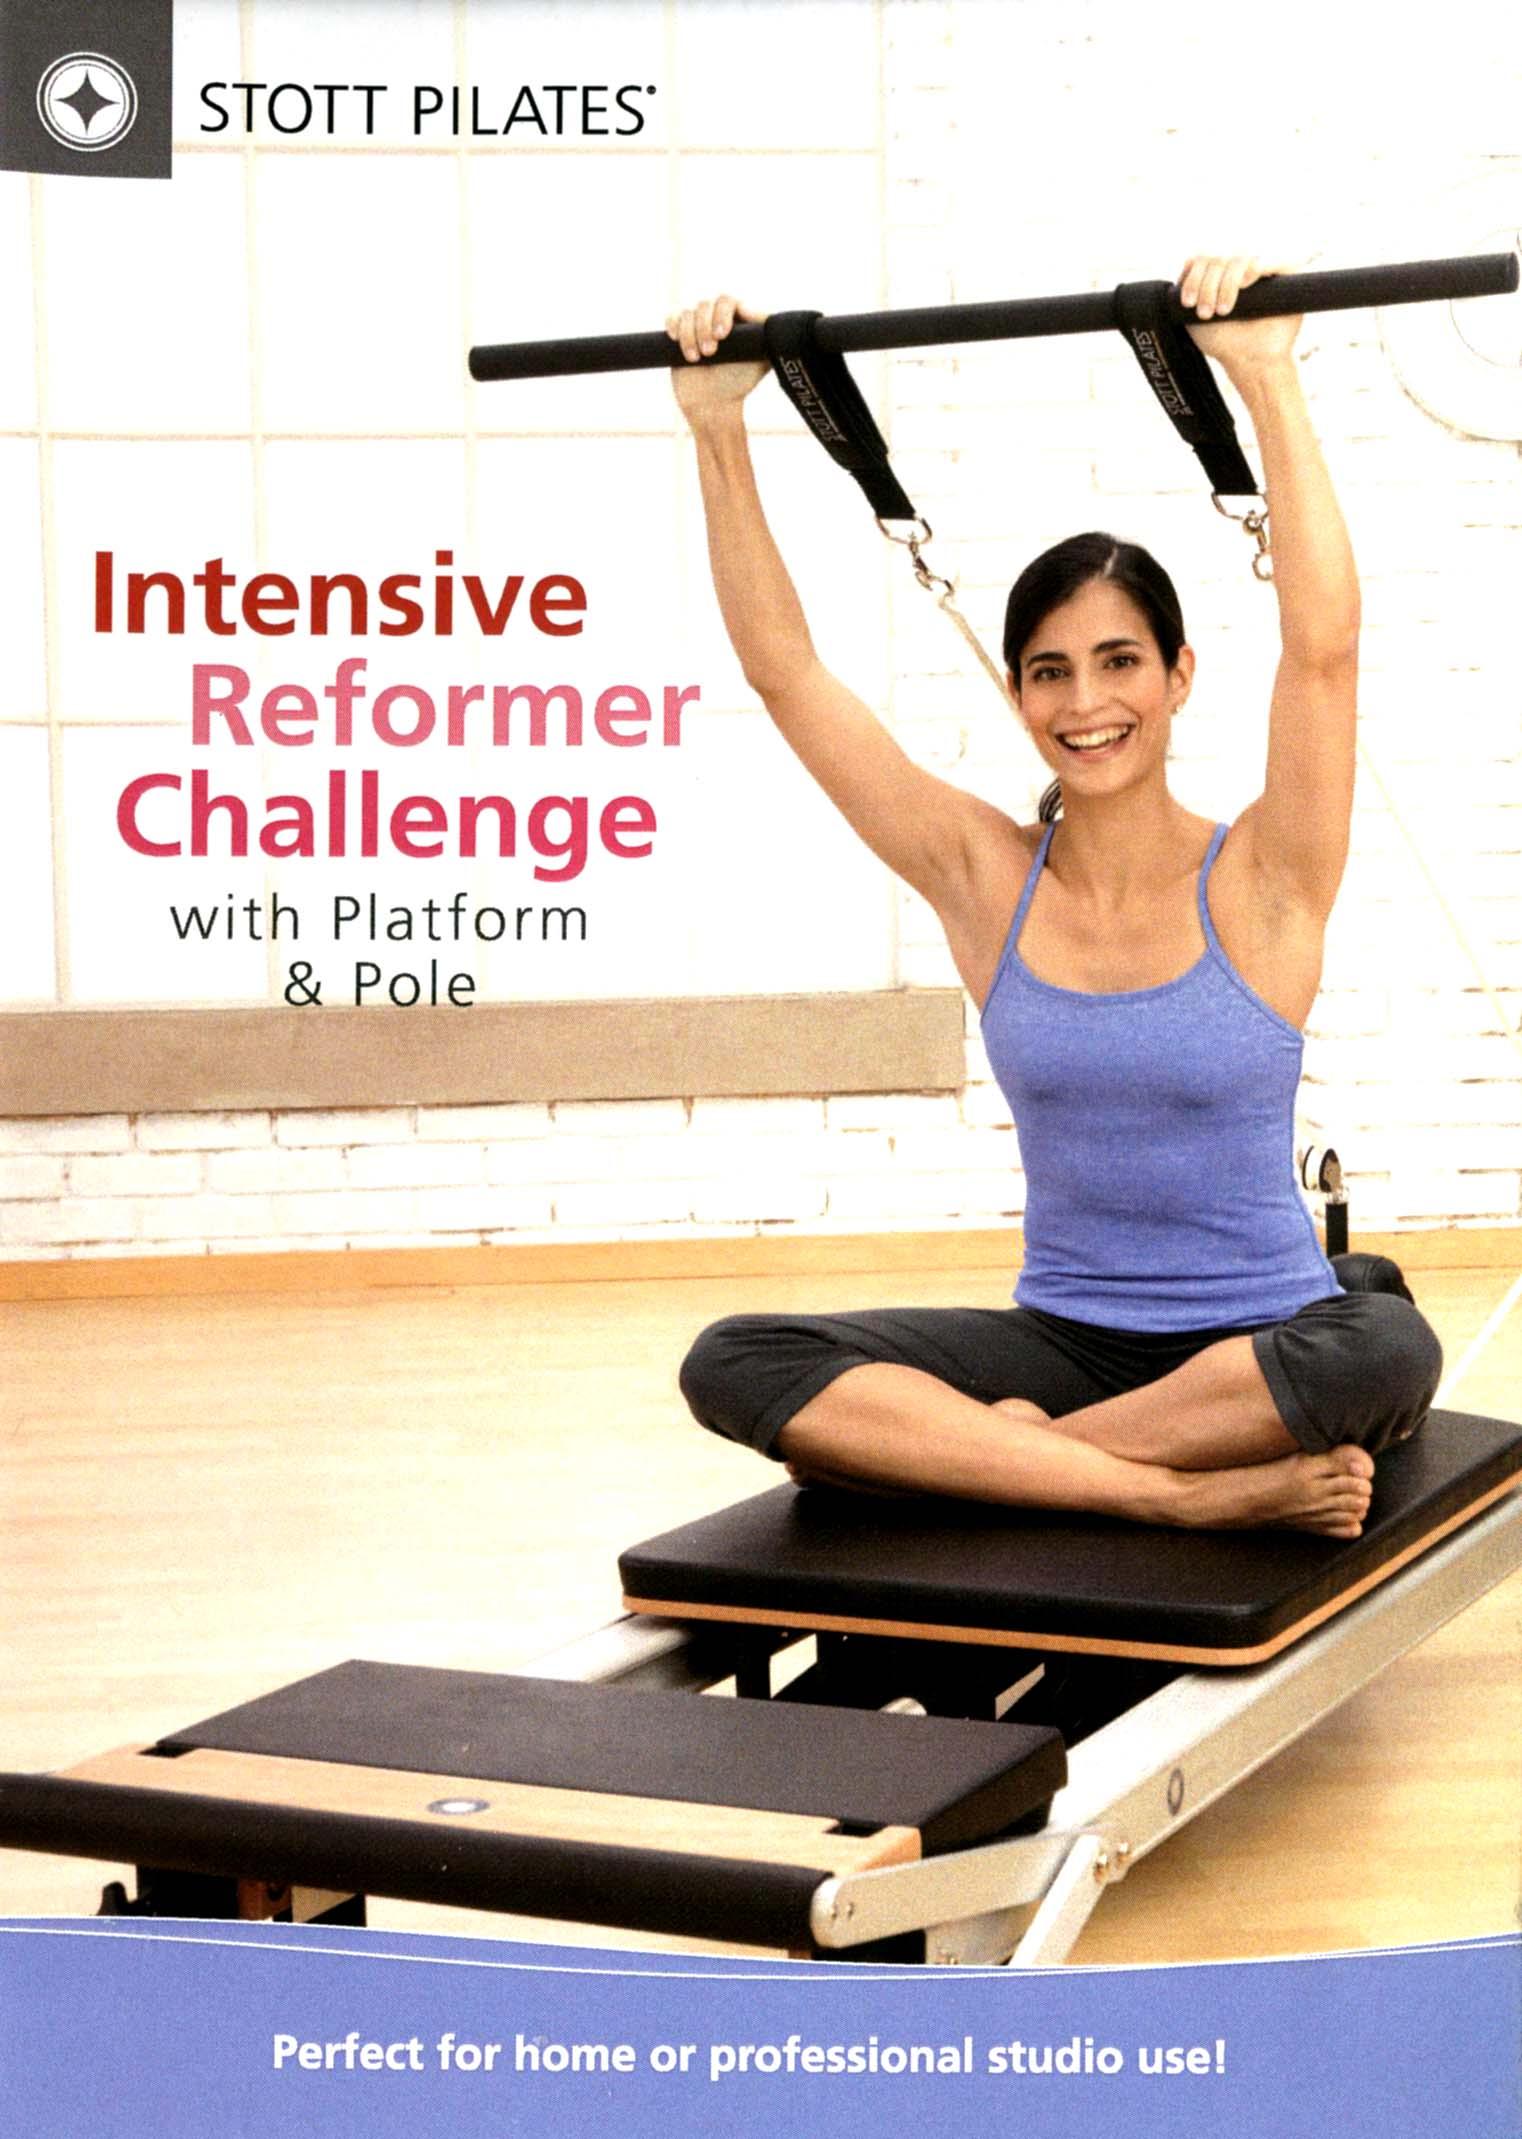 Stott Pilates: Intensive Reformer Challenge with Platform & Pole